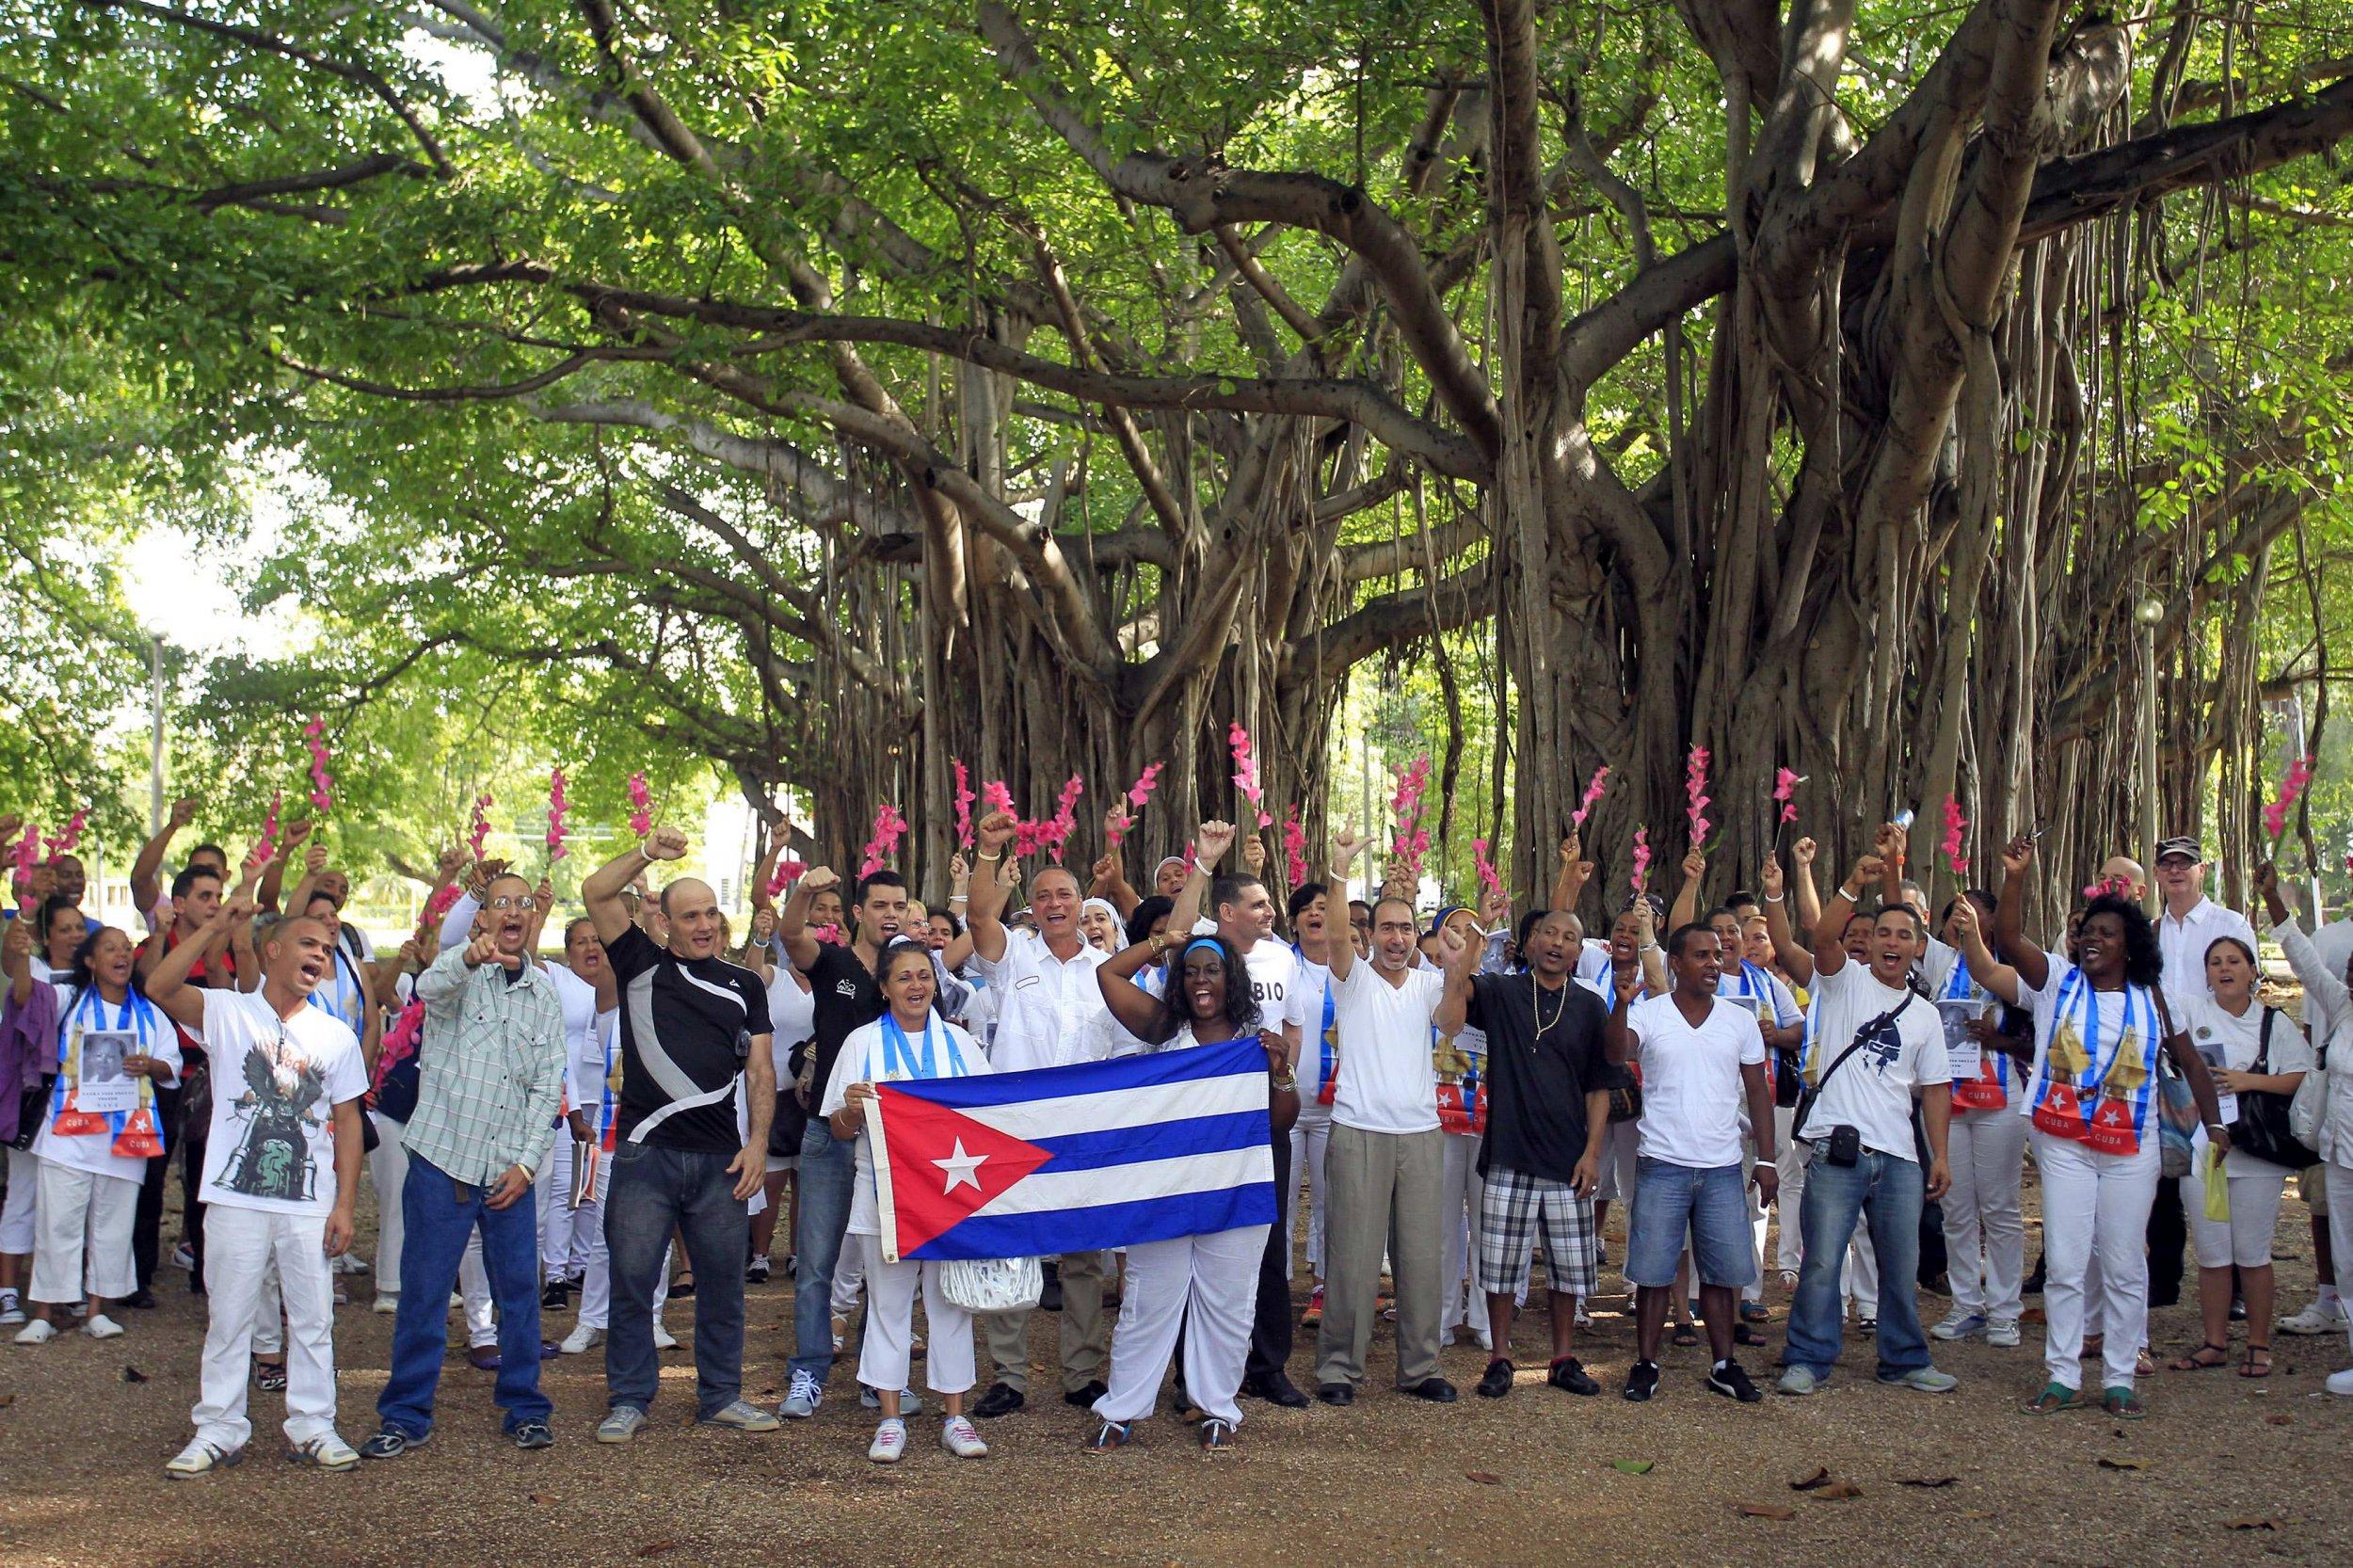 2015-01-13T192145Z_2_LYNXMPEB0C0RS_RTROPTP_4_USA-CUBA-PRISONERS